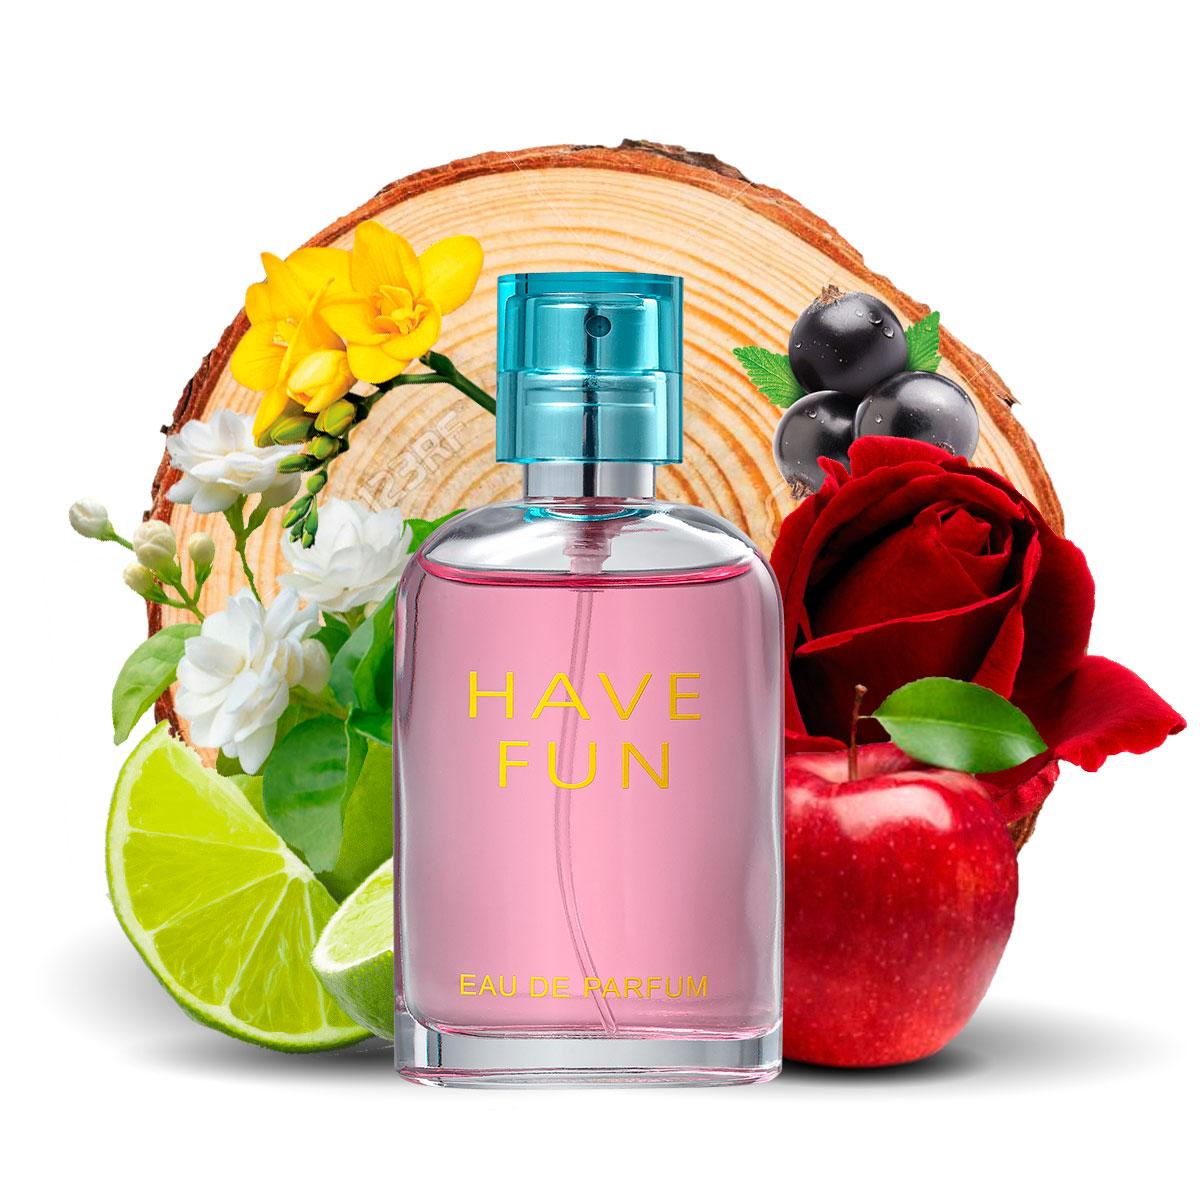 Kit  perfume Have Fun 90ml + 30ml de Bolsa La Rive